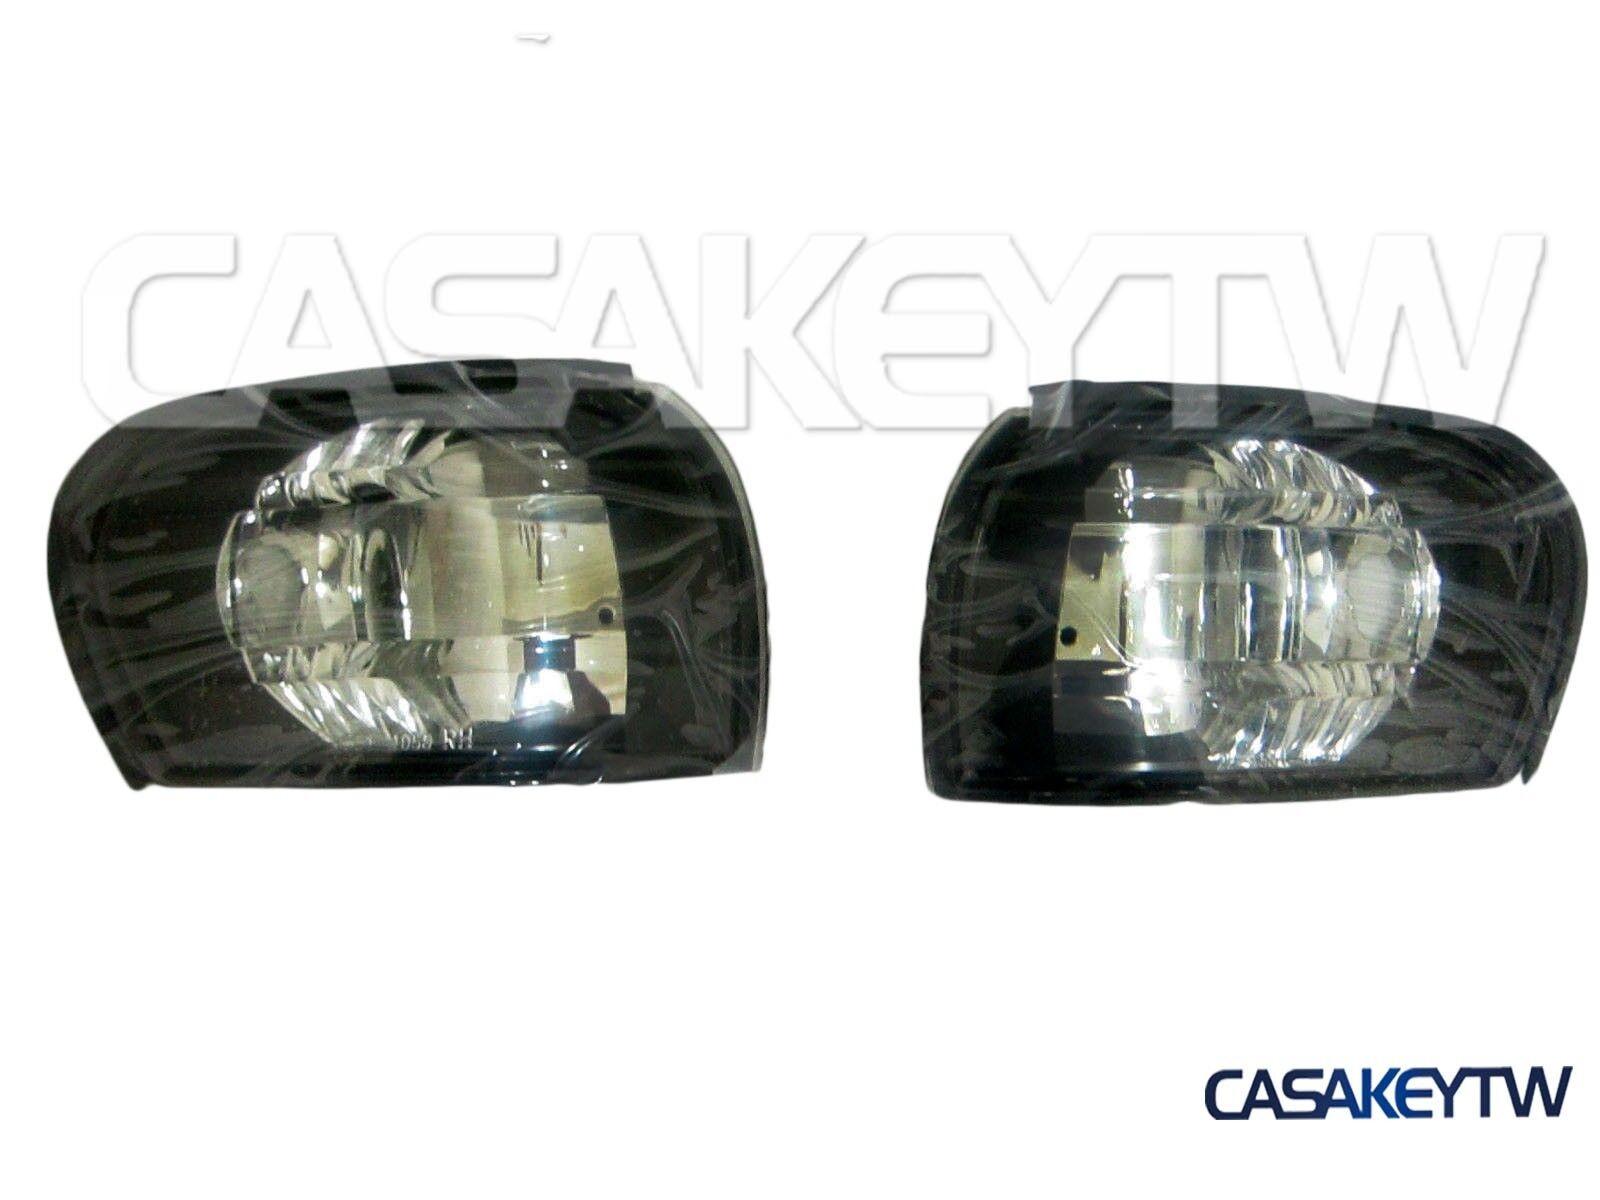 New Crystal Black Corner Lights Lamps 1995-2000 E-MARK Subaru IMPREZA GC8 CC8B